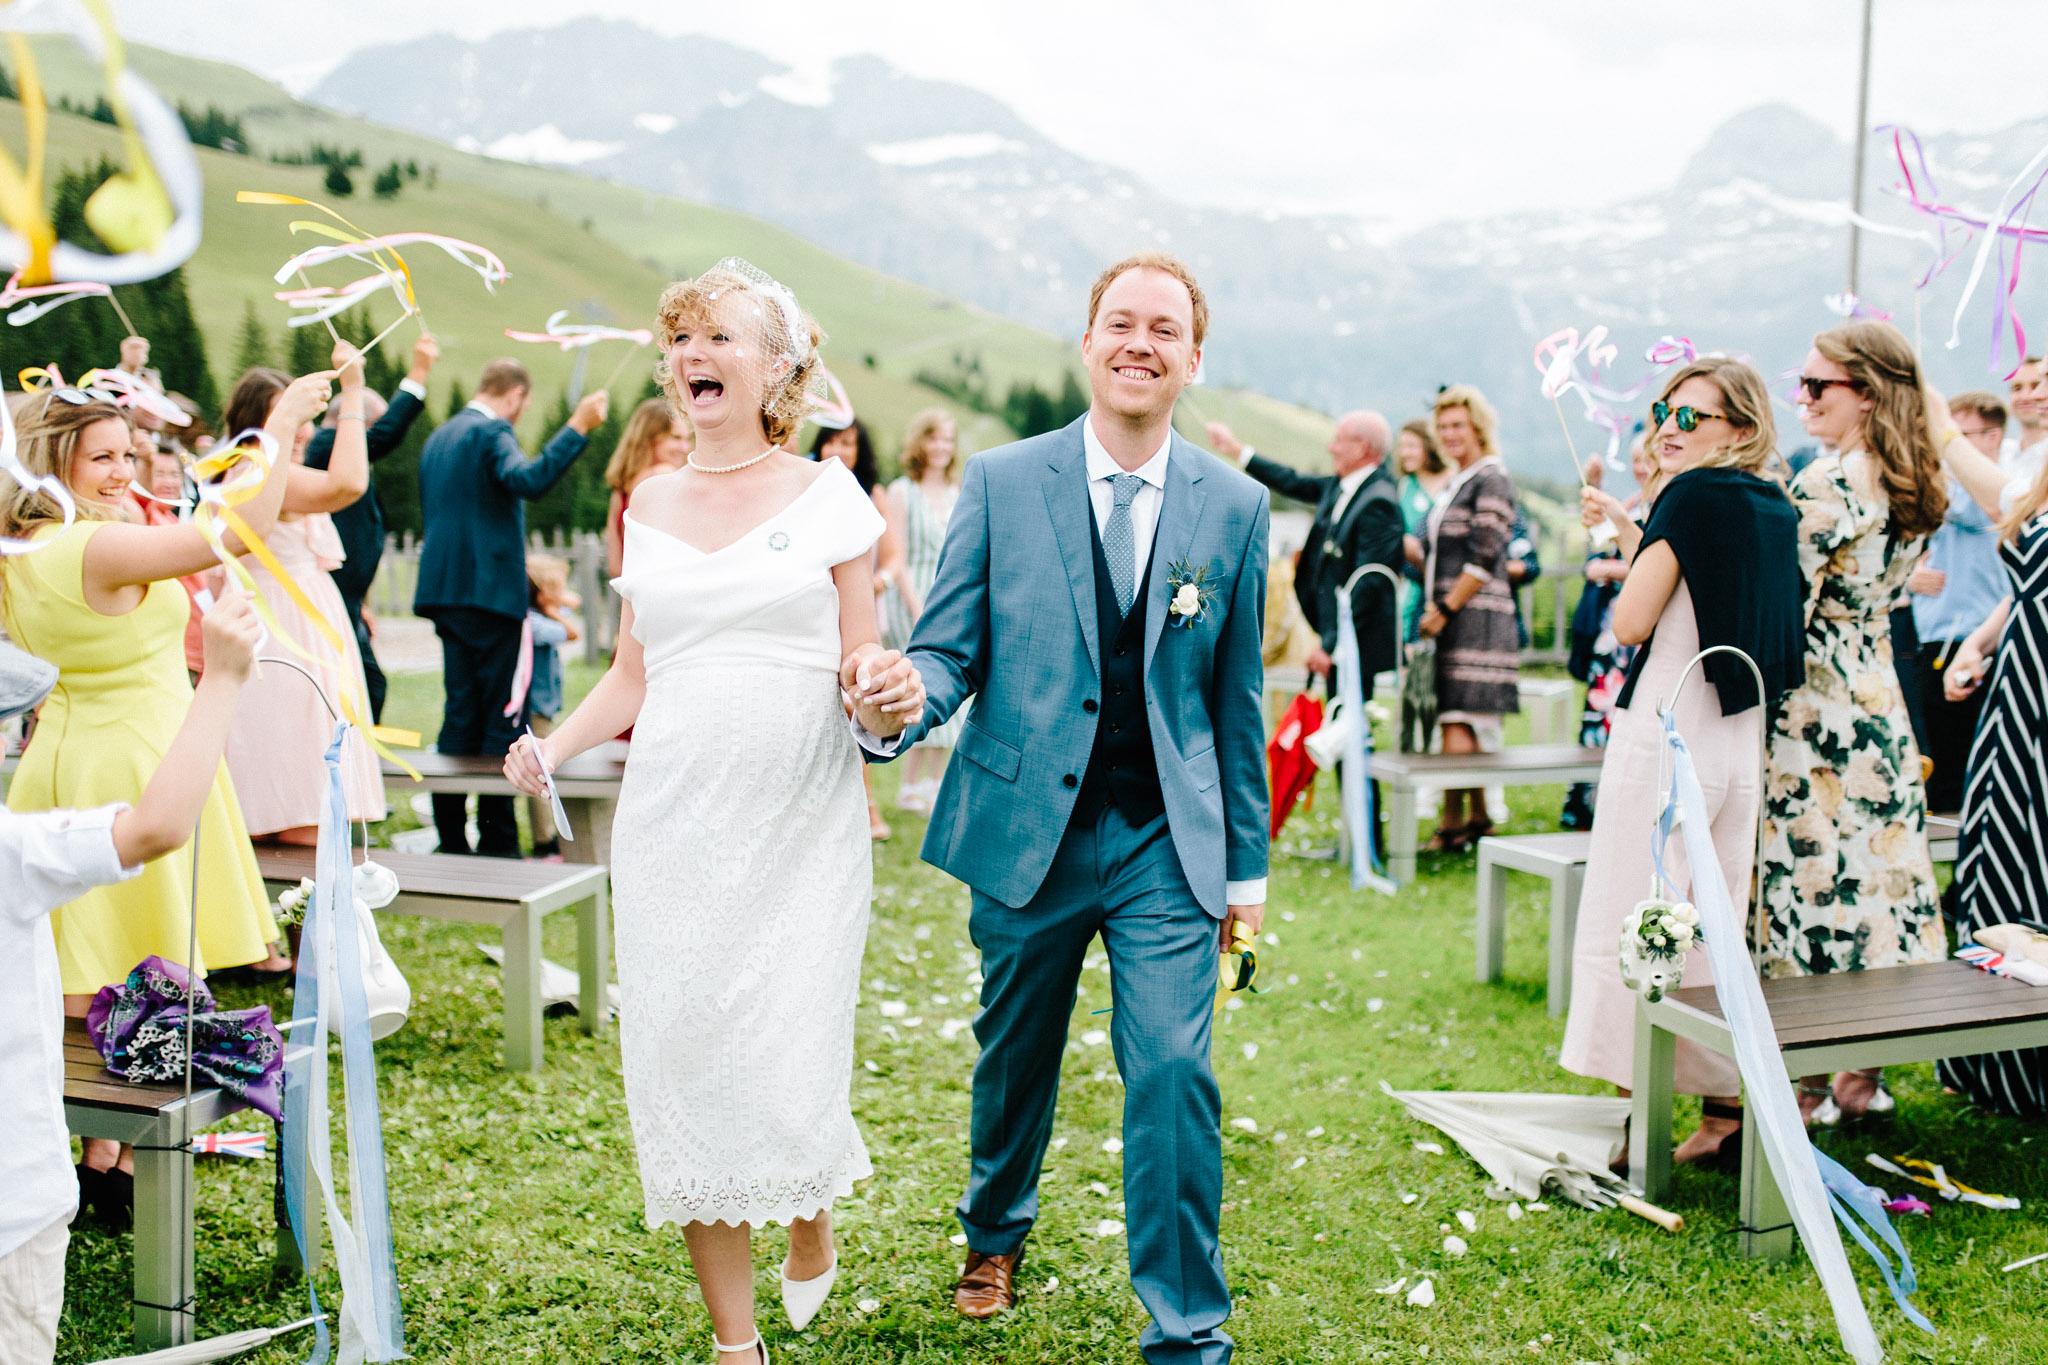 Lenl-Simmental-Buehlerhof-Pia-Anna-Christian-Wedding-Photography-EK-85.jpg